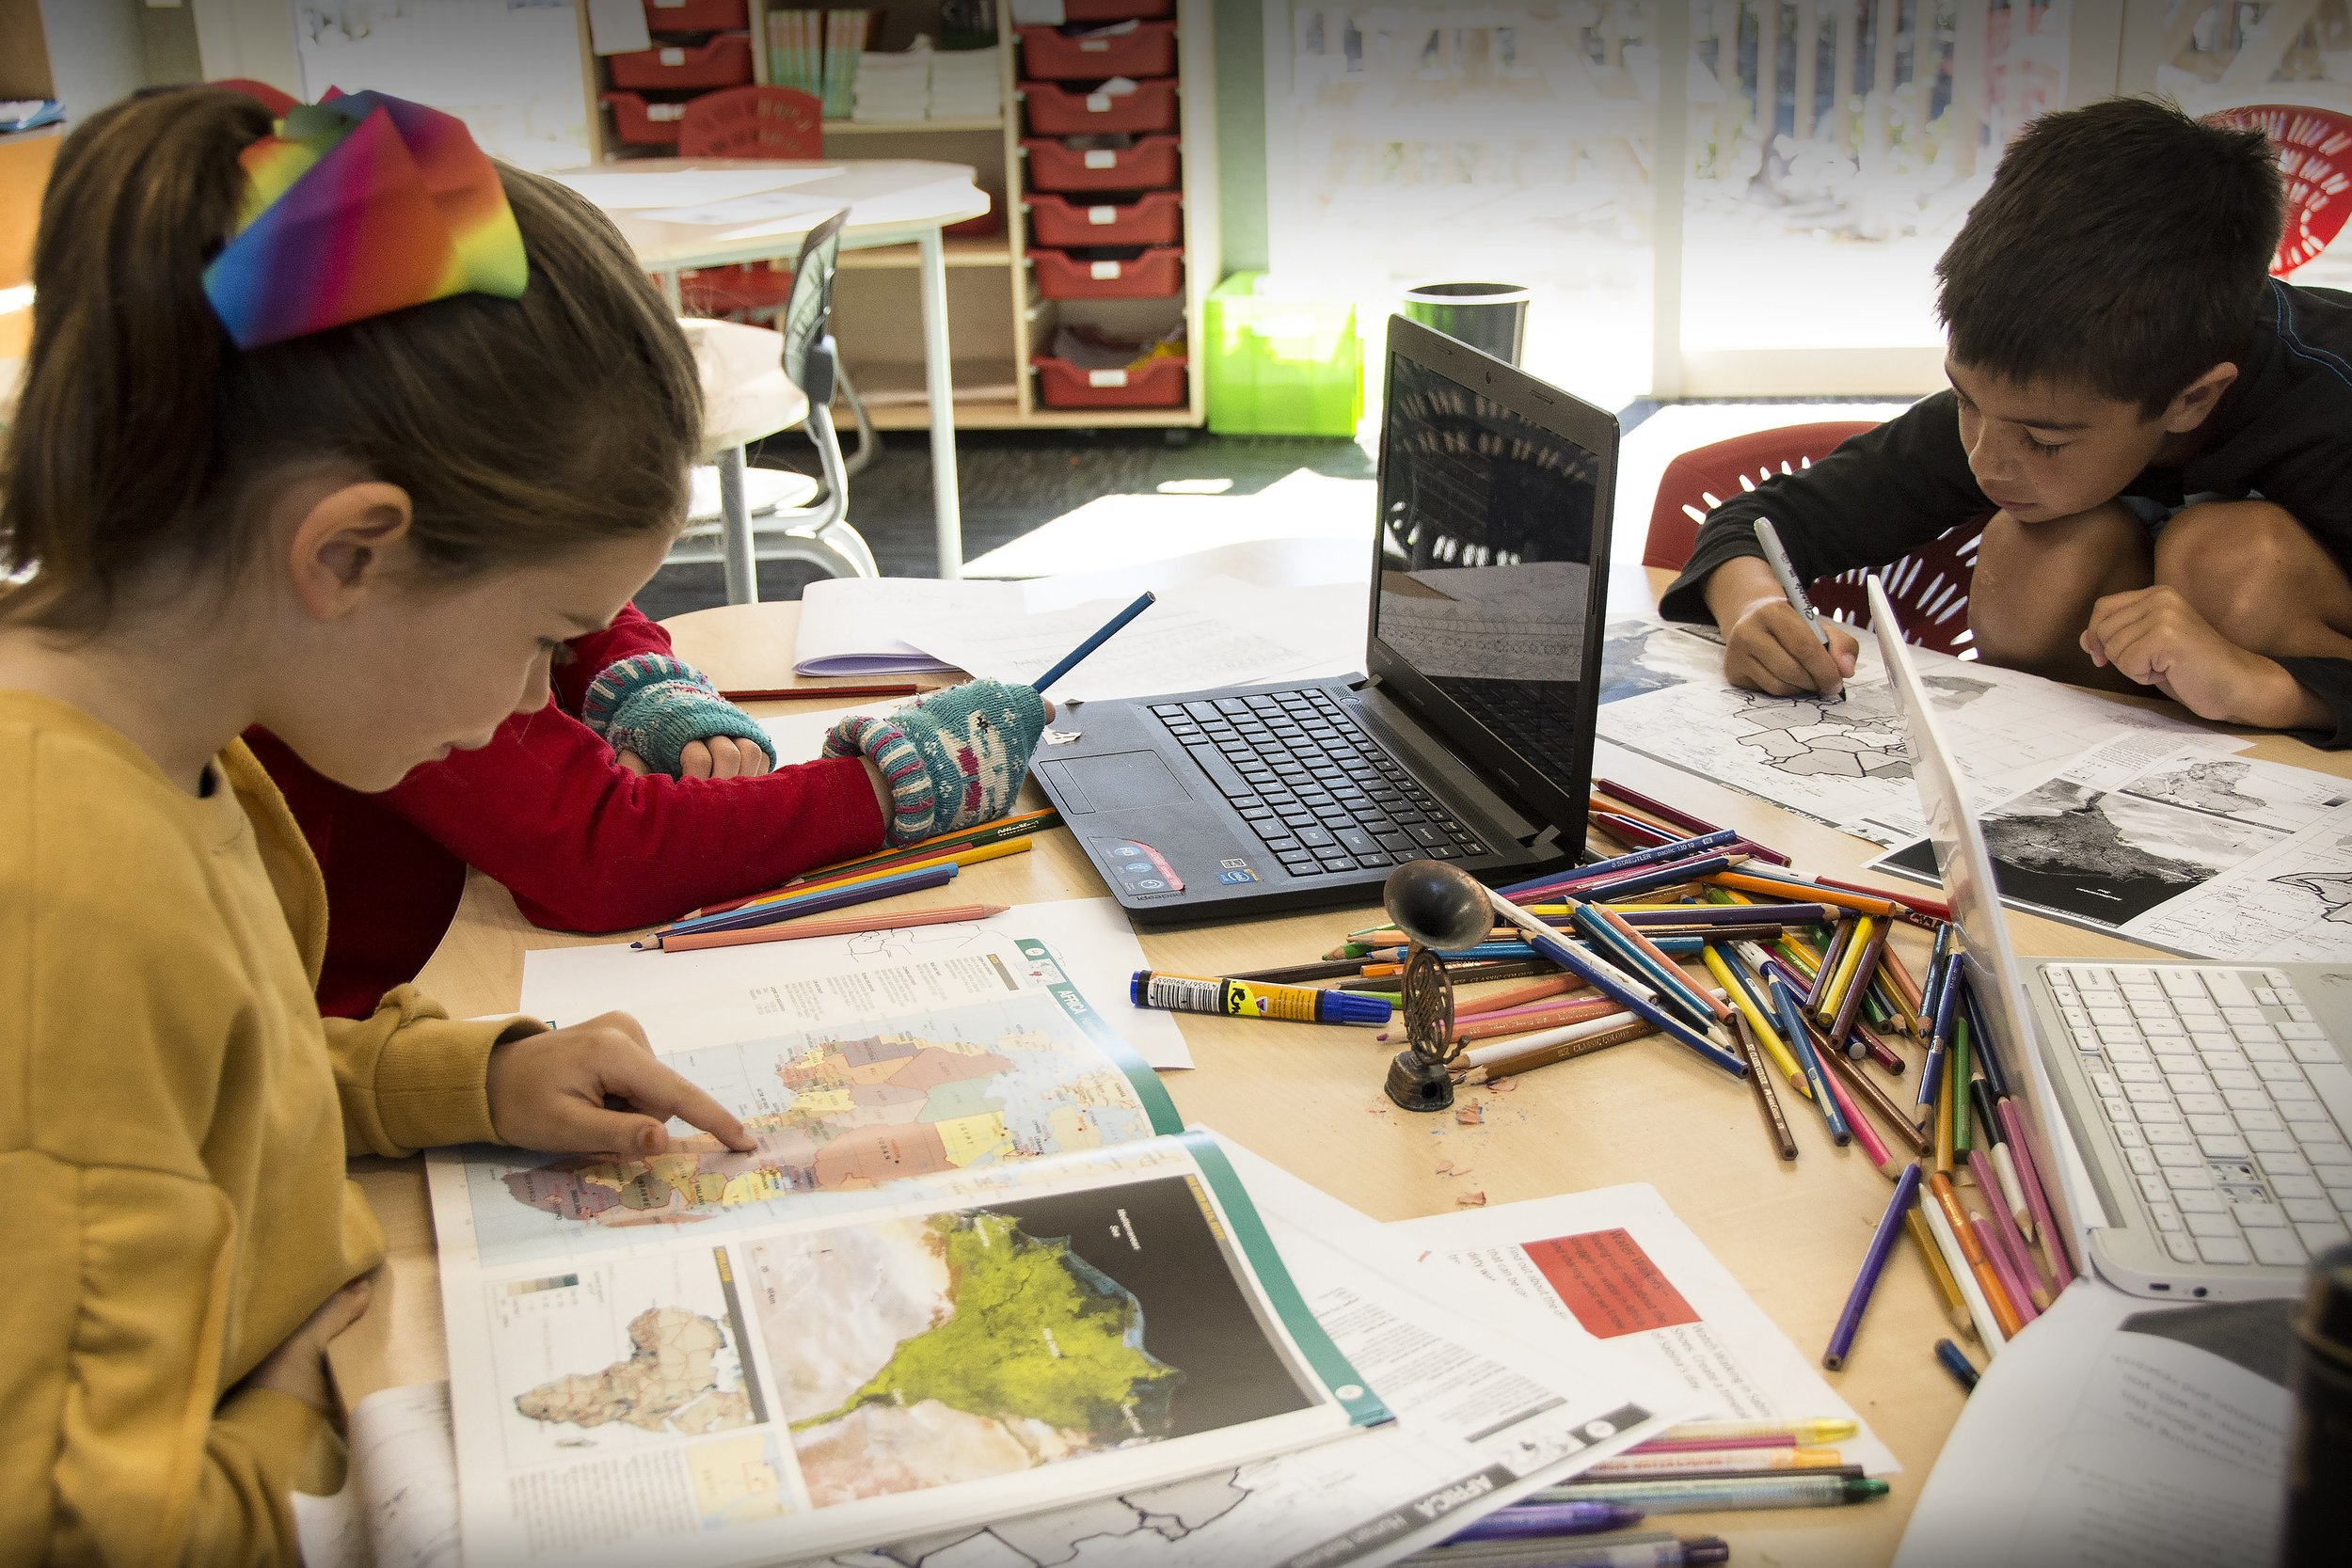 hira classroom learning